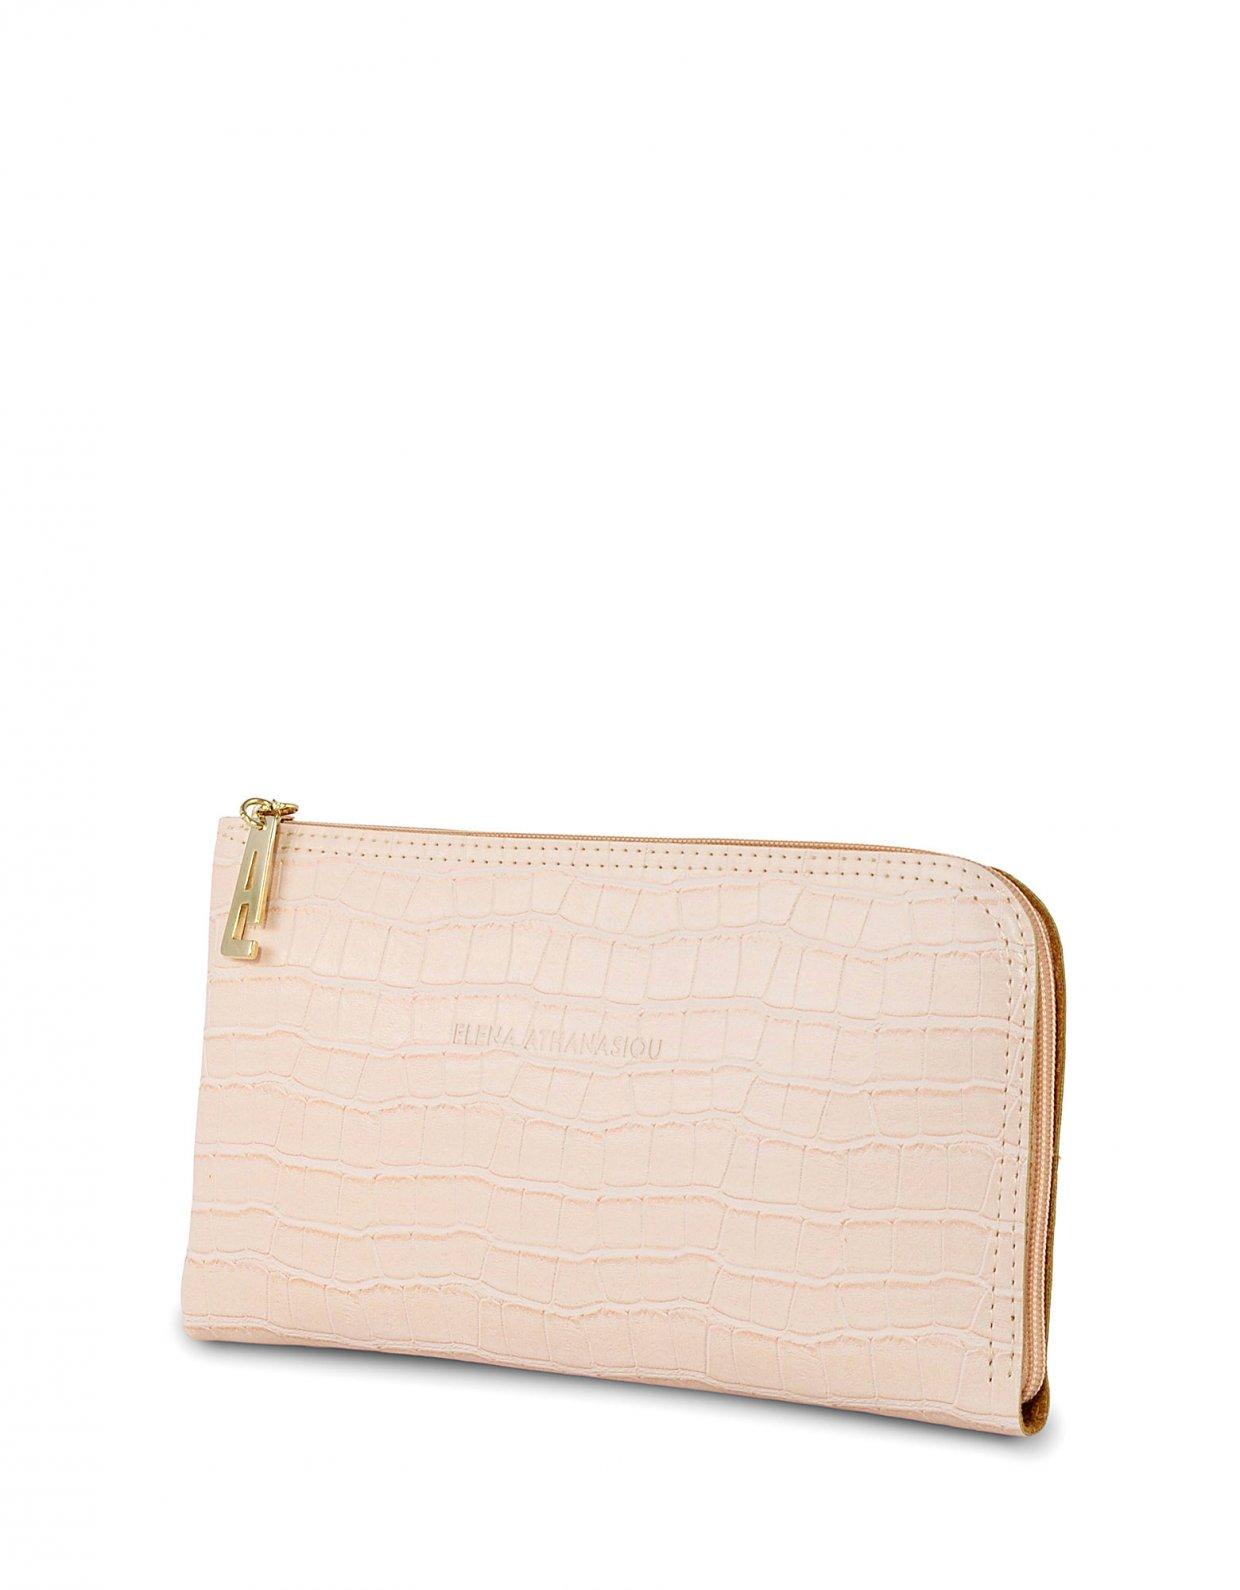 Elena Athanasiou Clutch bag powder pink croco